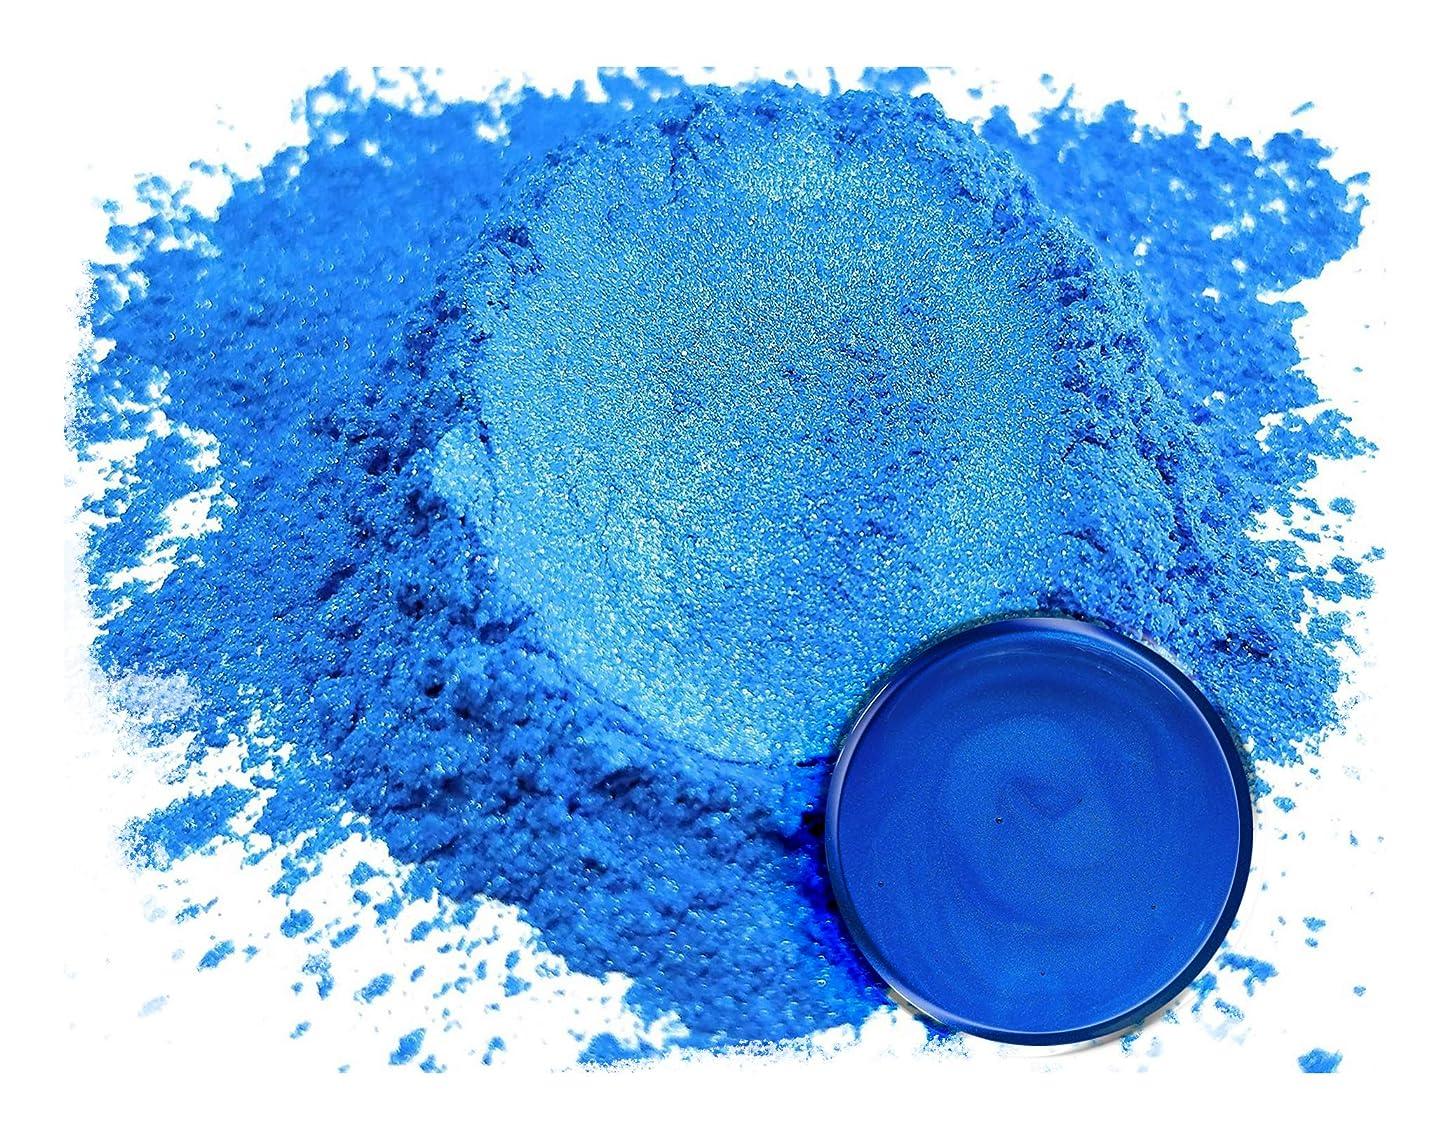 Eye Candy Pearls 25gr Dark Ocean Blue Mica Powder Pigments (Resin, Paint, Epoxy, Soaps, Nail Polish, Liquid Wraps)